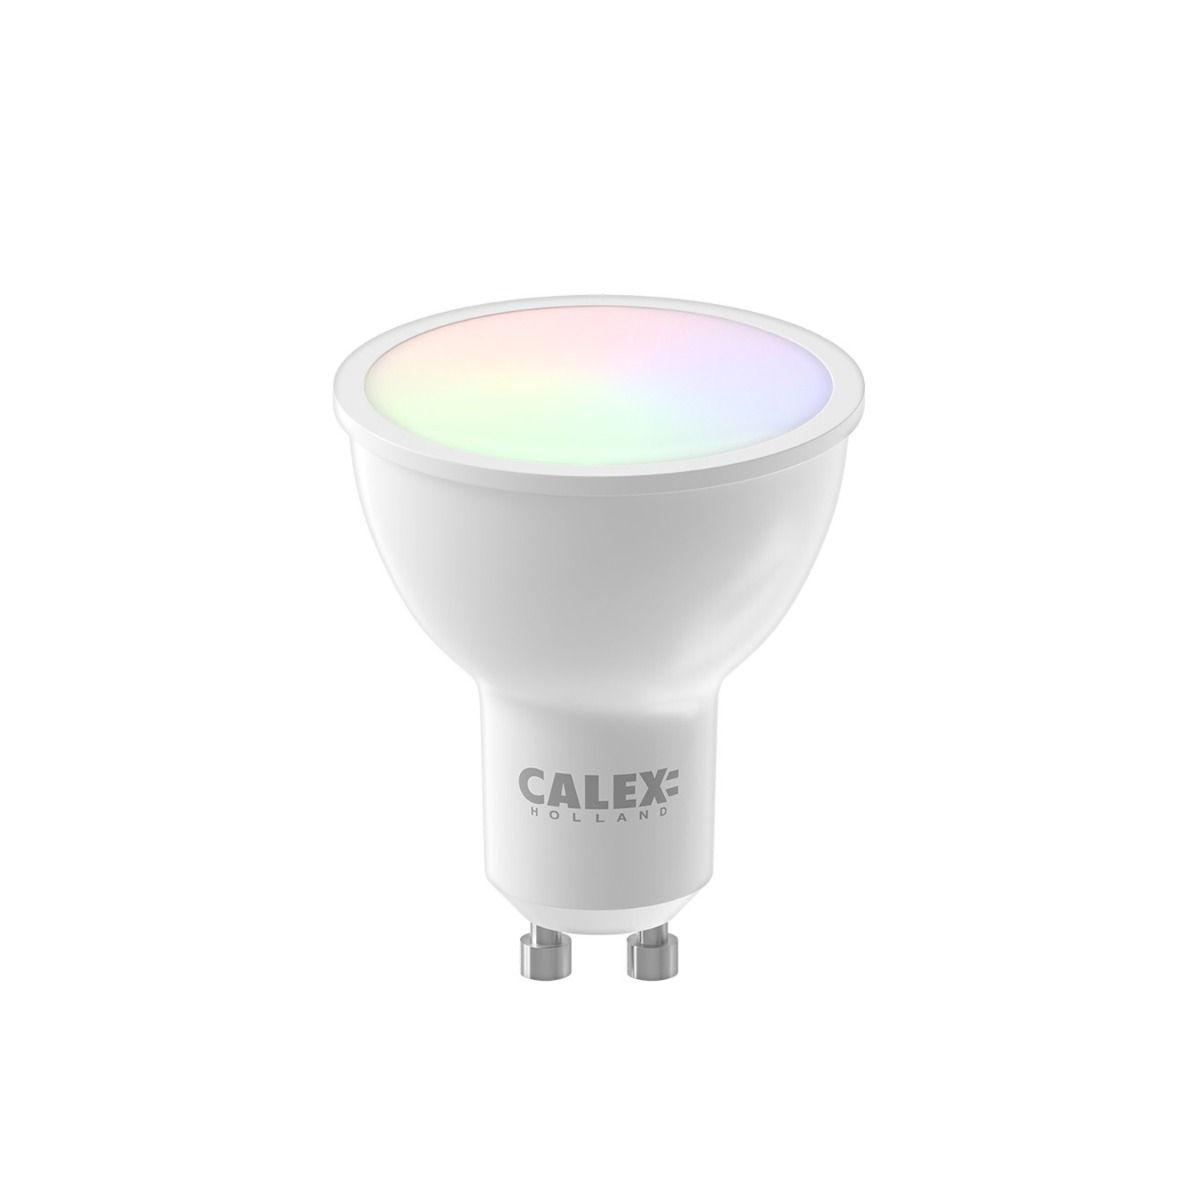 Calex Smart Reflector LED Spot GU10 5W 345lm 2200-4000K | Tuya Wifi - Afstembaar Wit